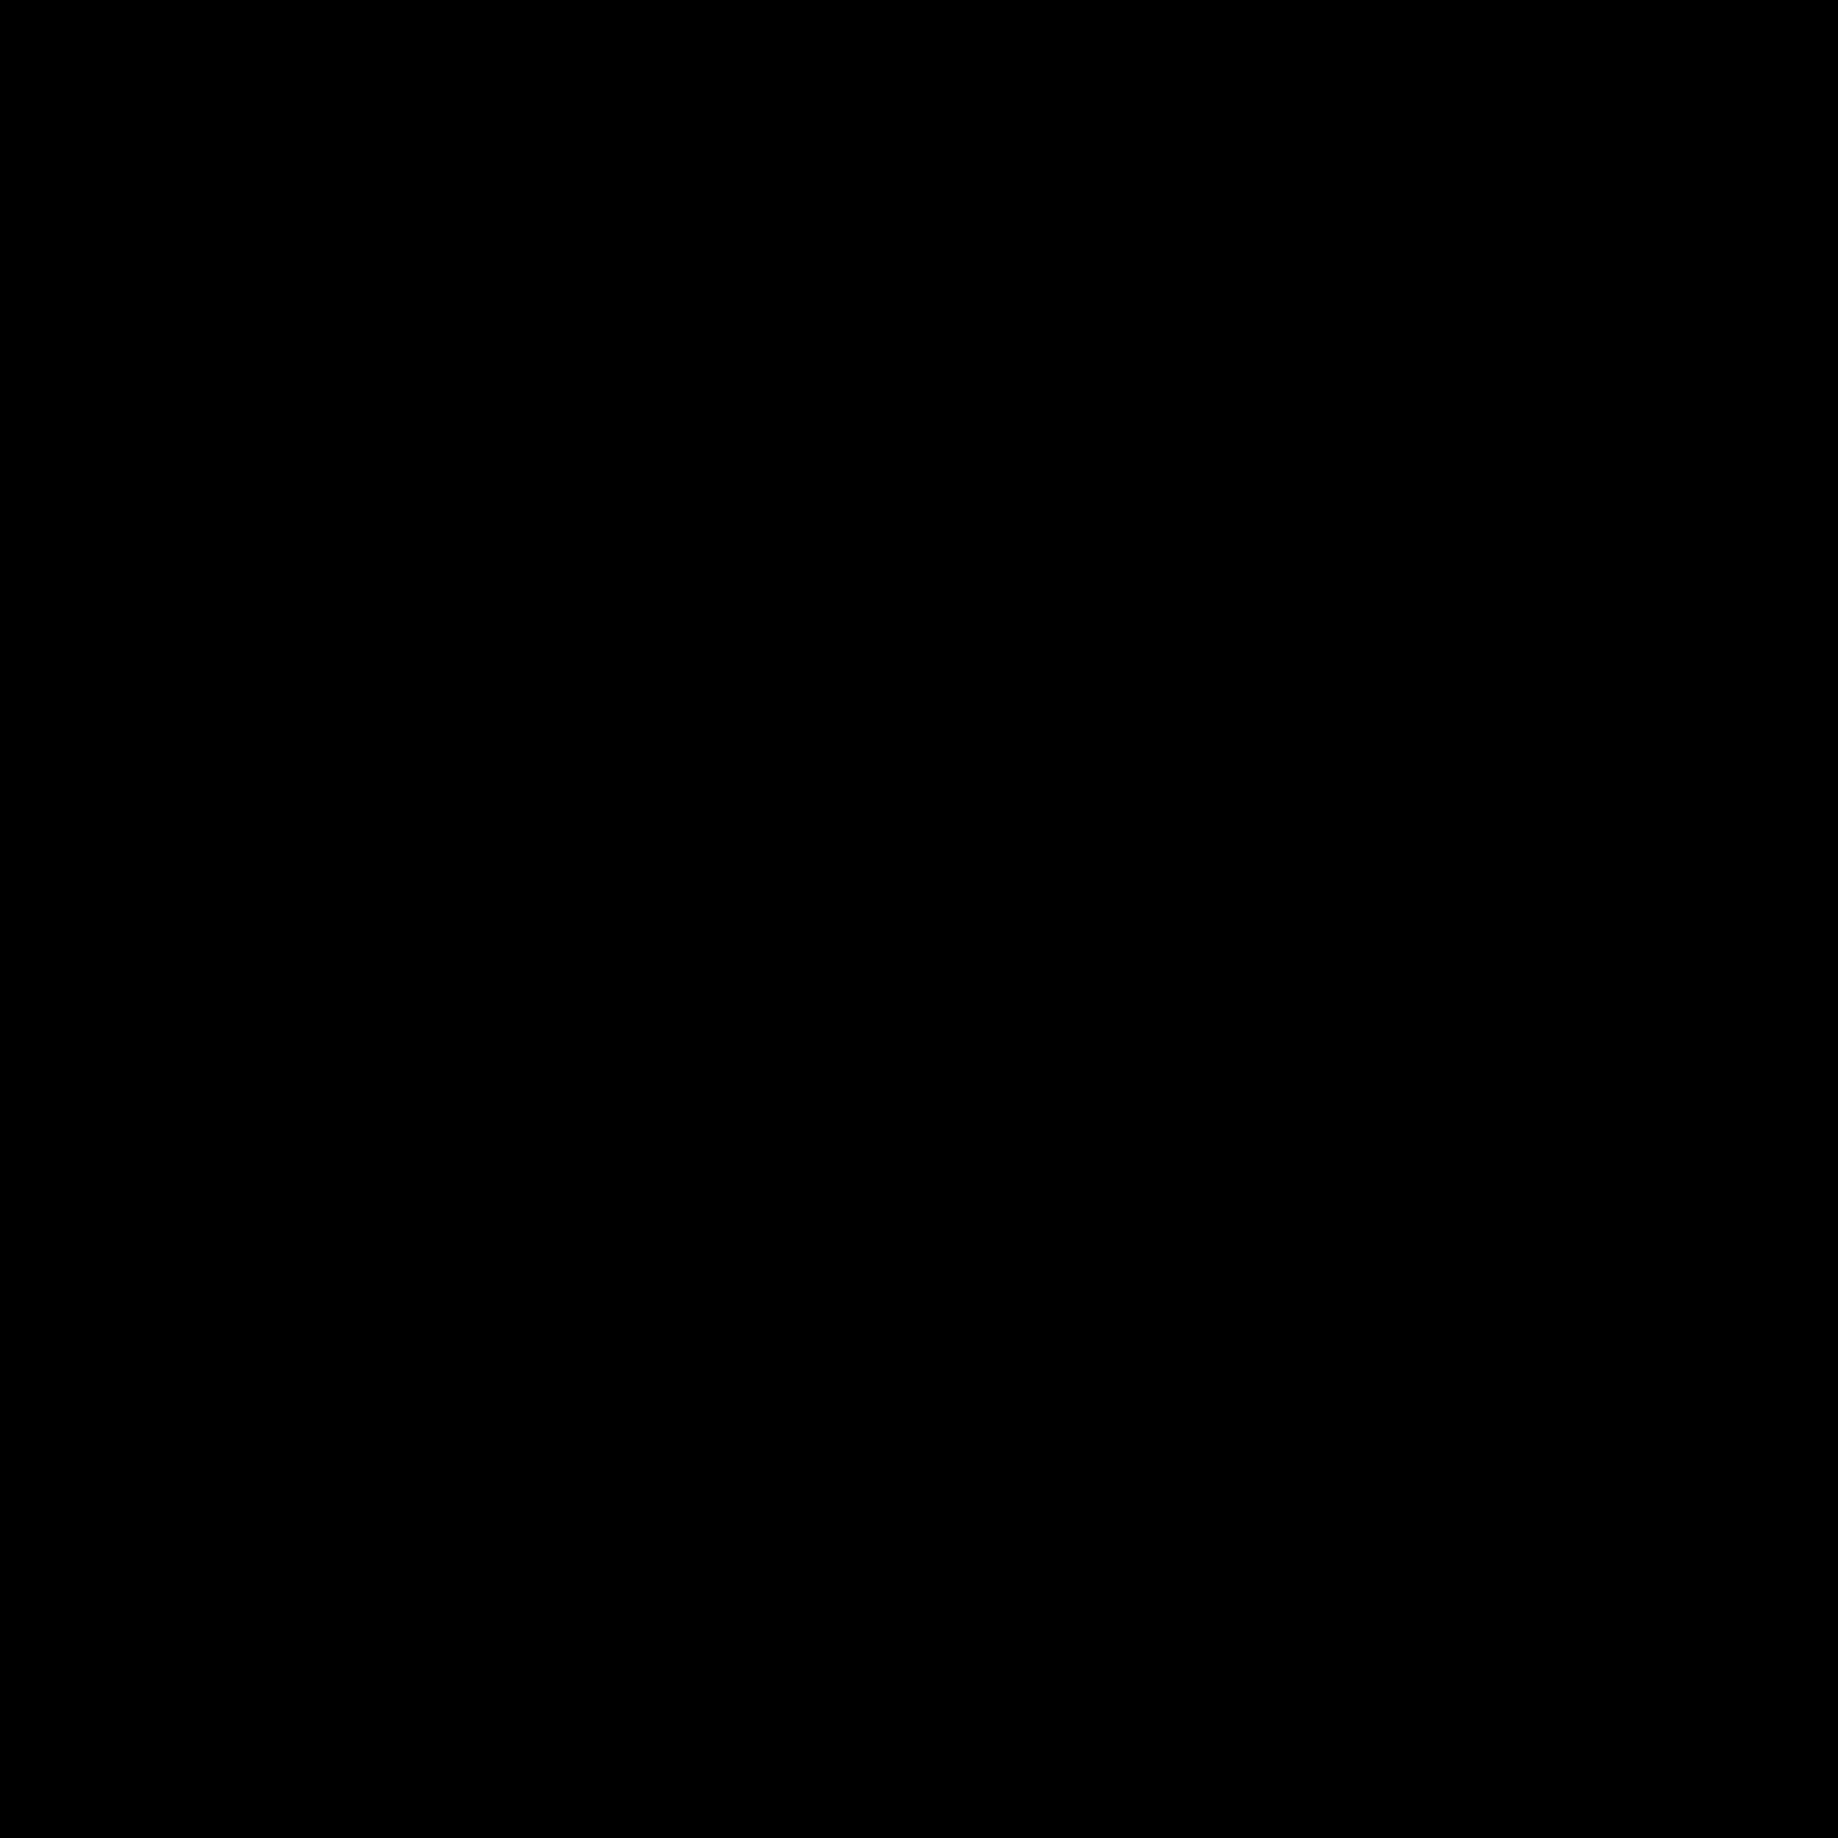 Gustavianische Originale